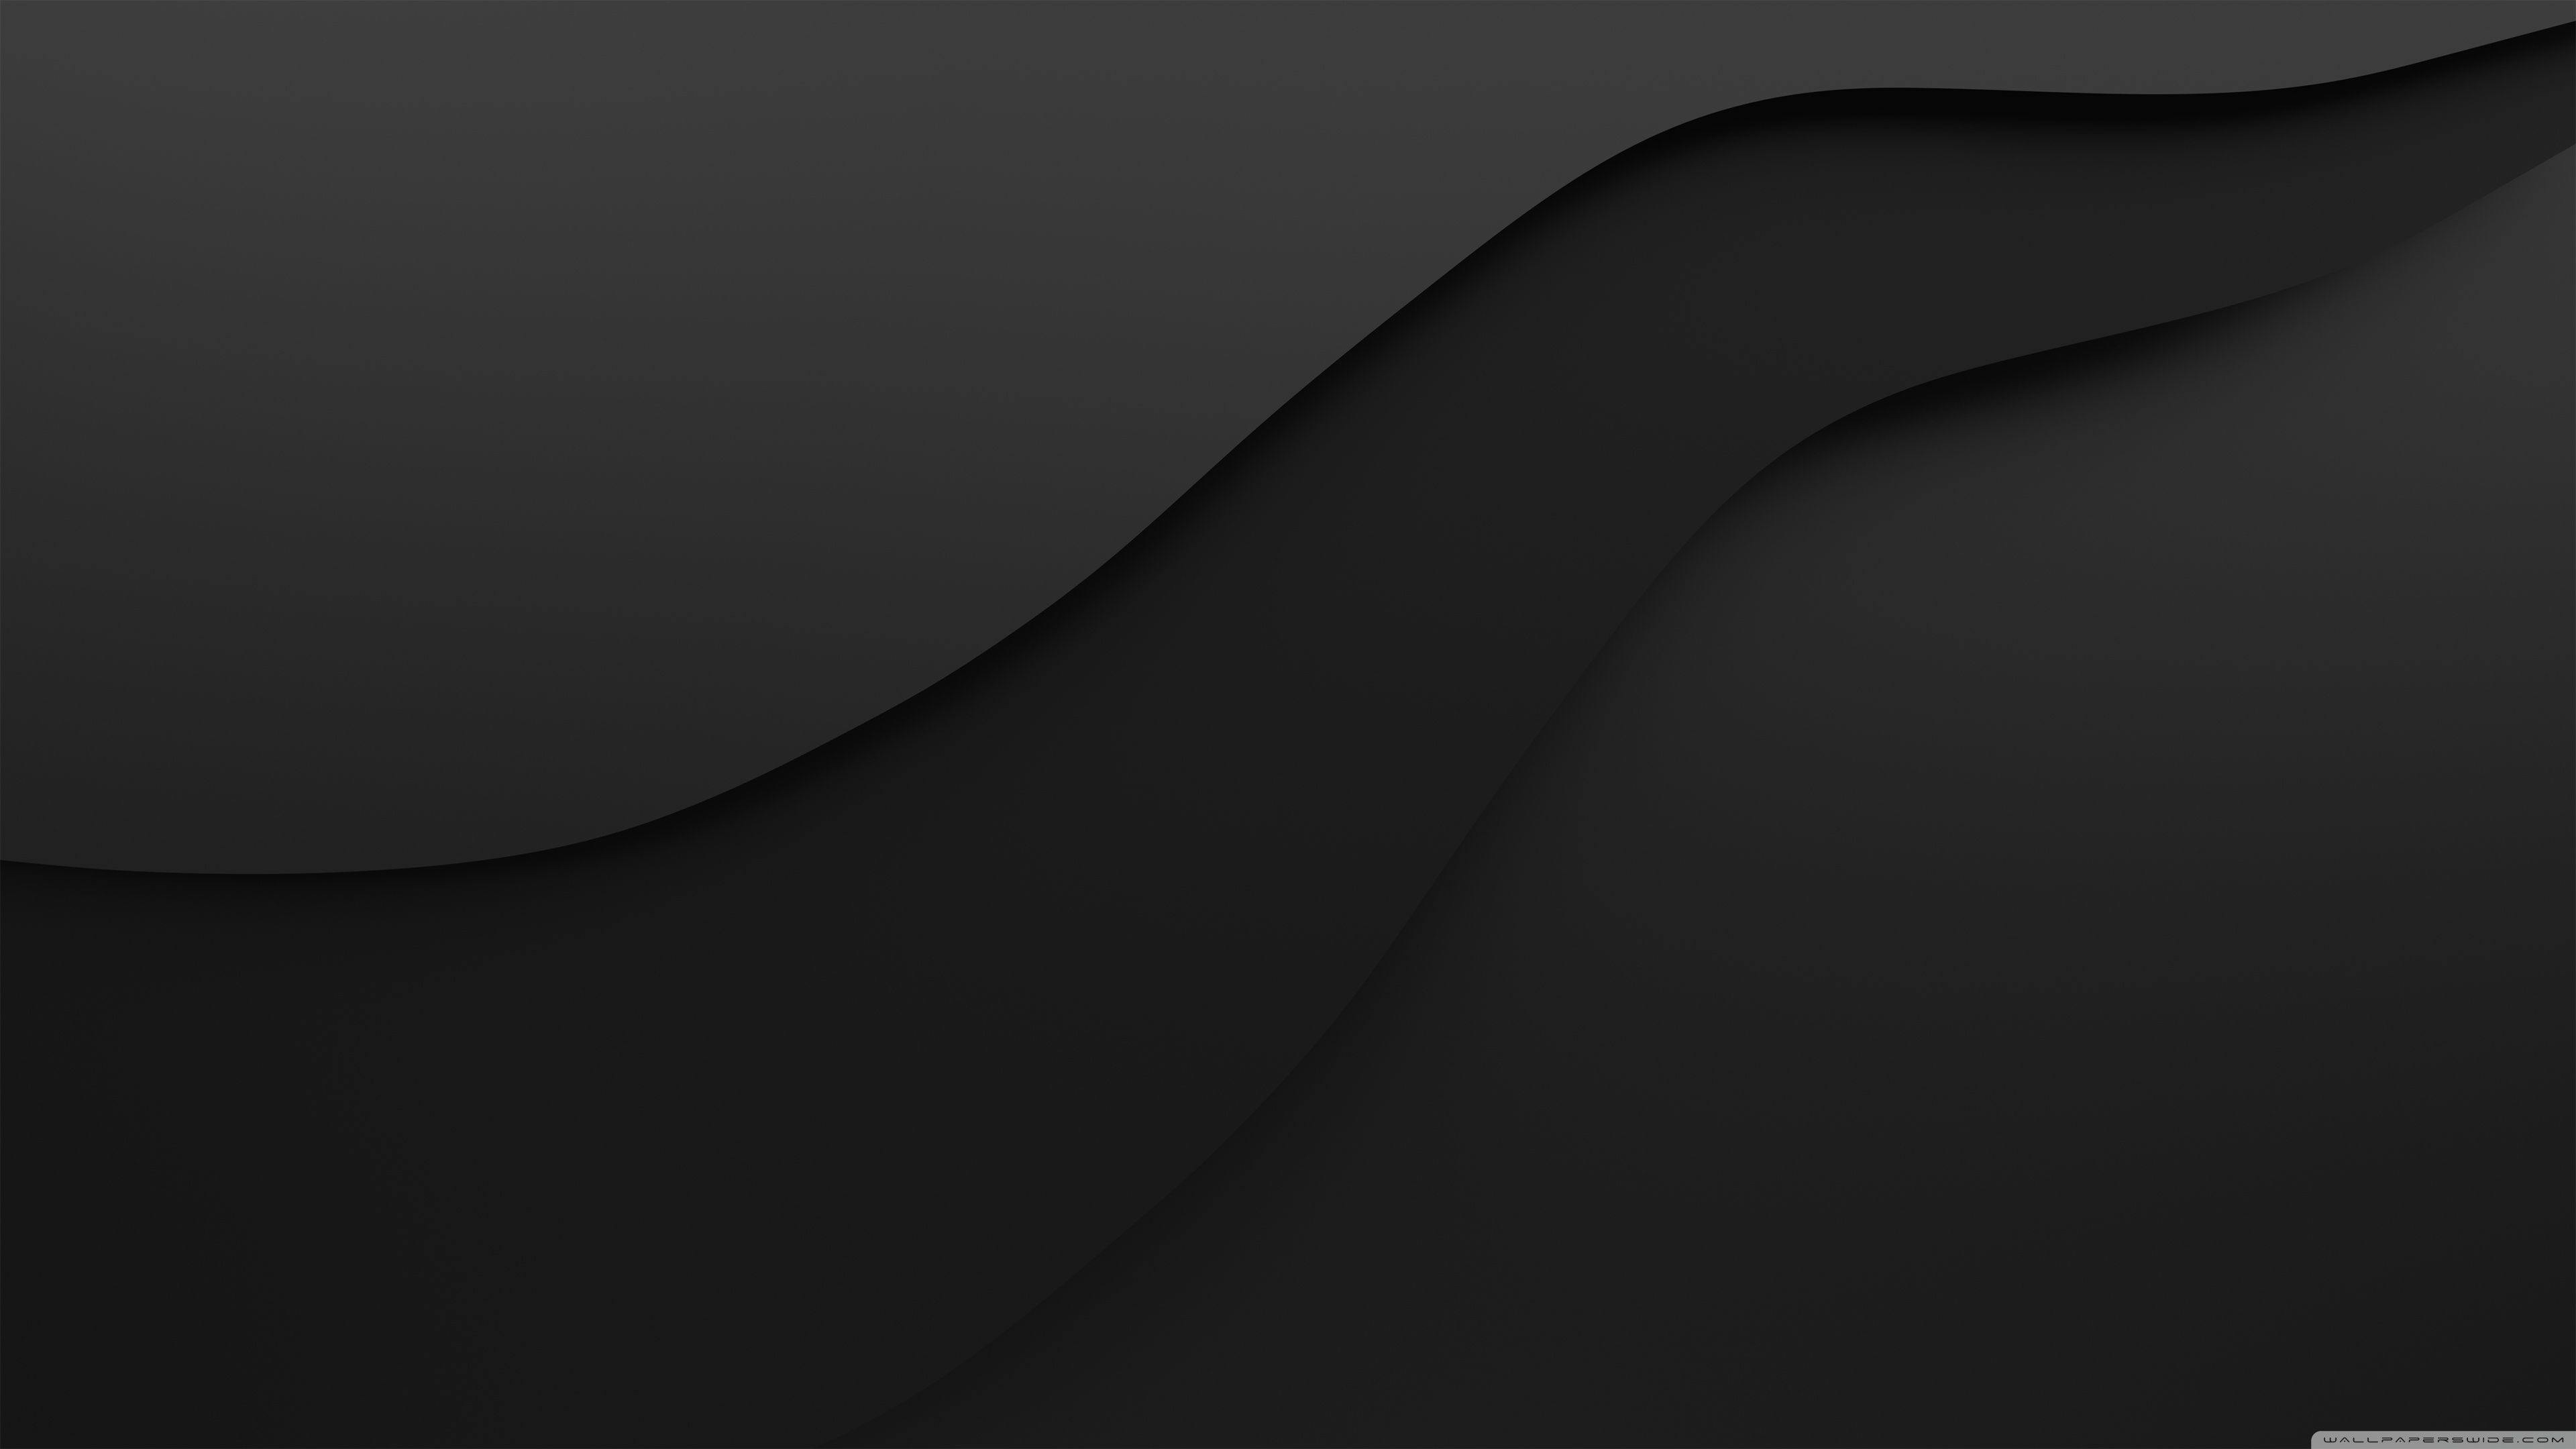 Crevasse Black Full Hd Backgraunds 4k Dark Desktop Wallpaper Ultrahd 3840x2160